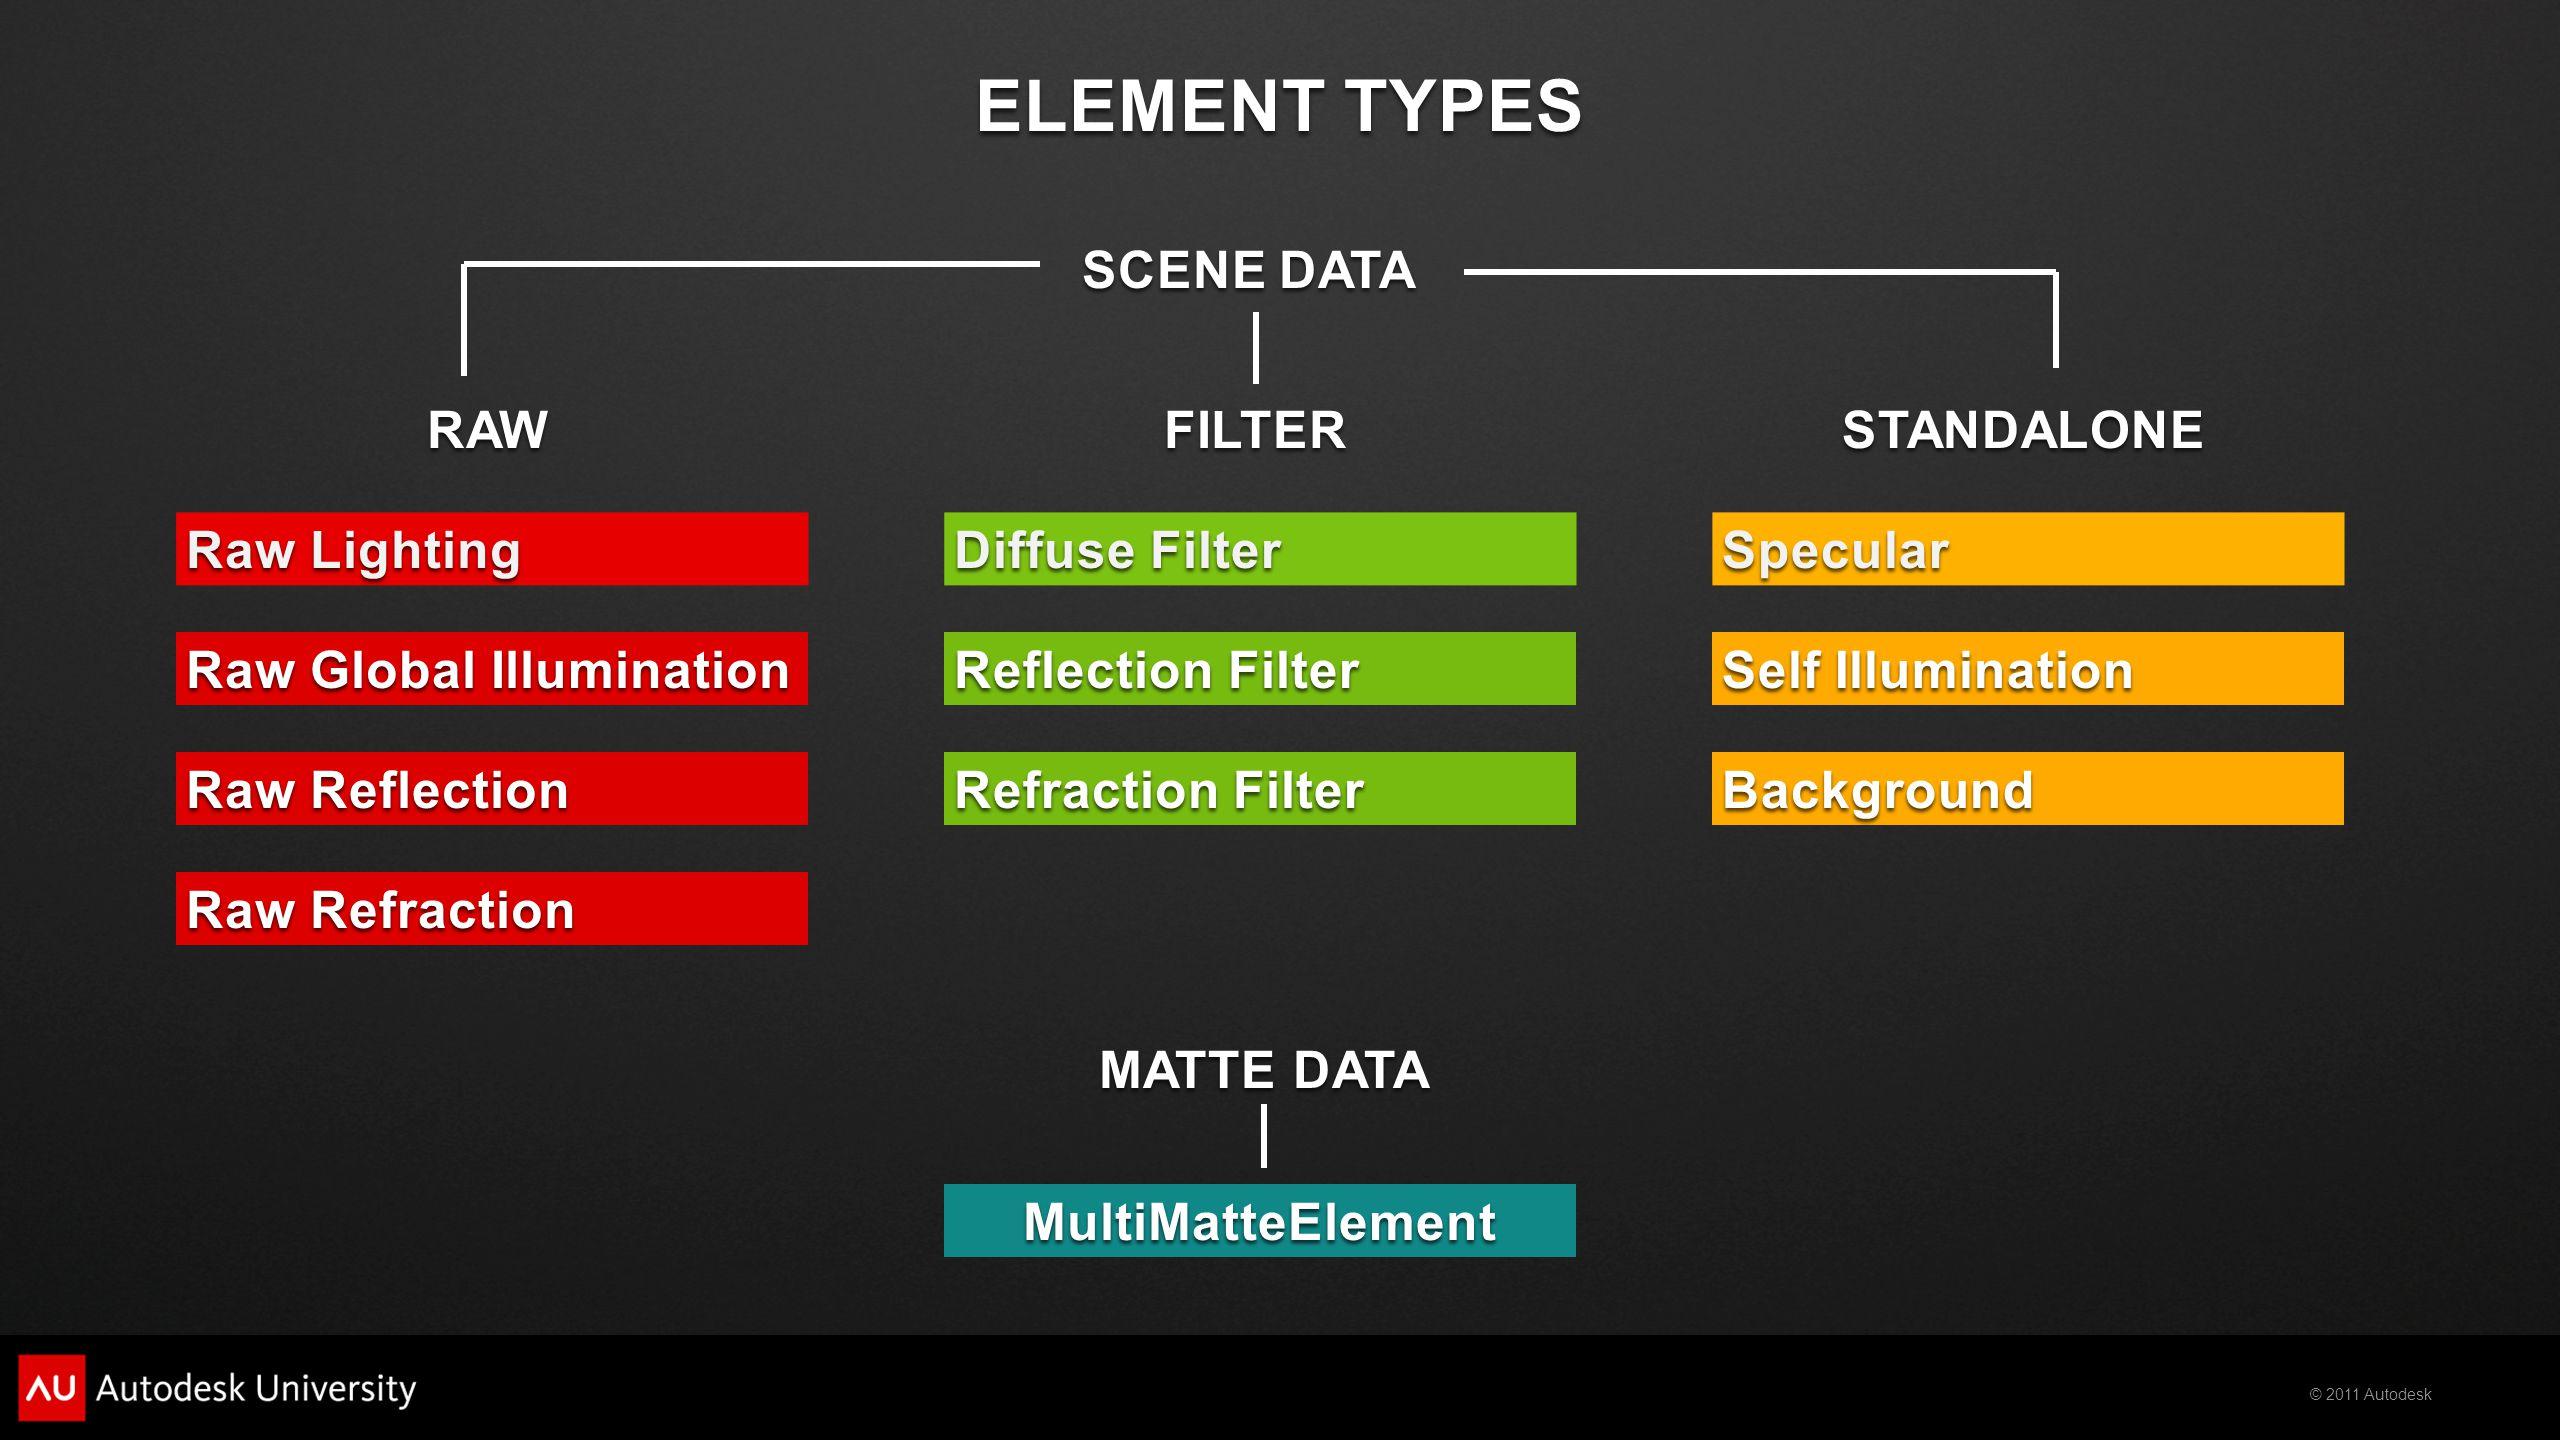 © 2011 Autodesk Z-DEPTH RENDER ELEMENT COMPOSITION LENS BLUR FILTER DEPTH OF FIELD - Node Diagram